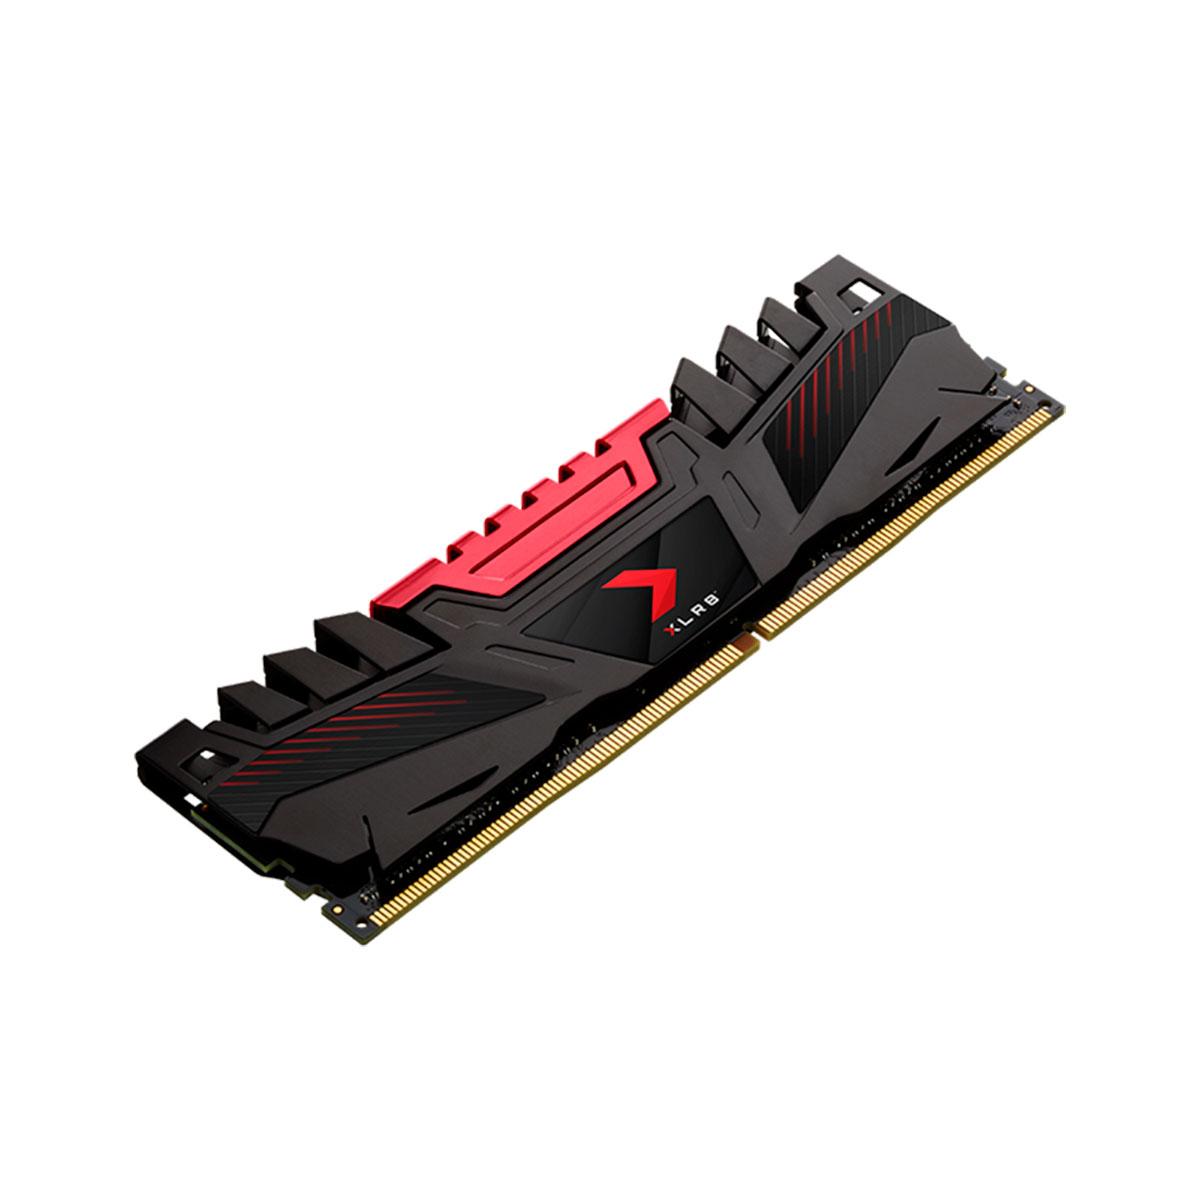 Memória Gamer PNY XLR8 8GB, DDR4, 3200MHz, CL16, 1.35V MD8GD4320016XR